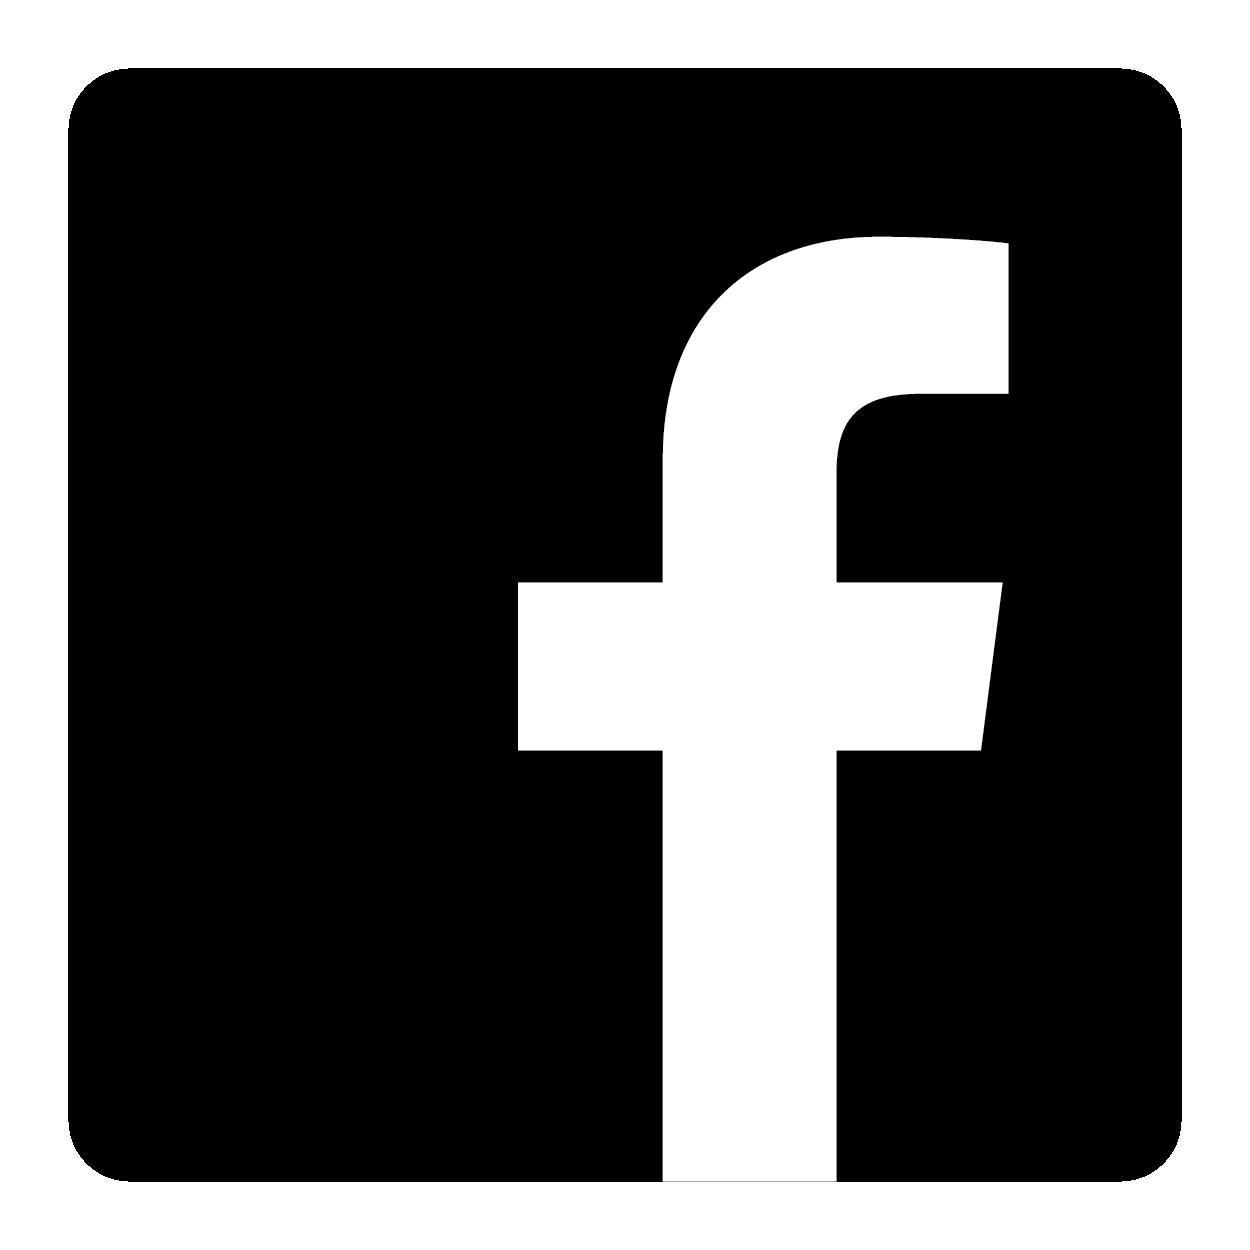 ReThink Facebook